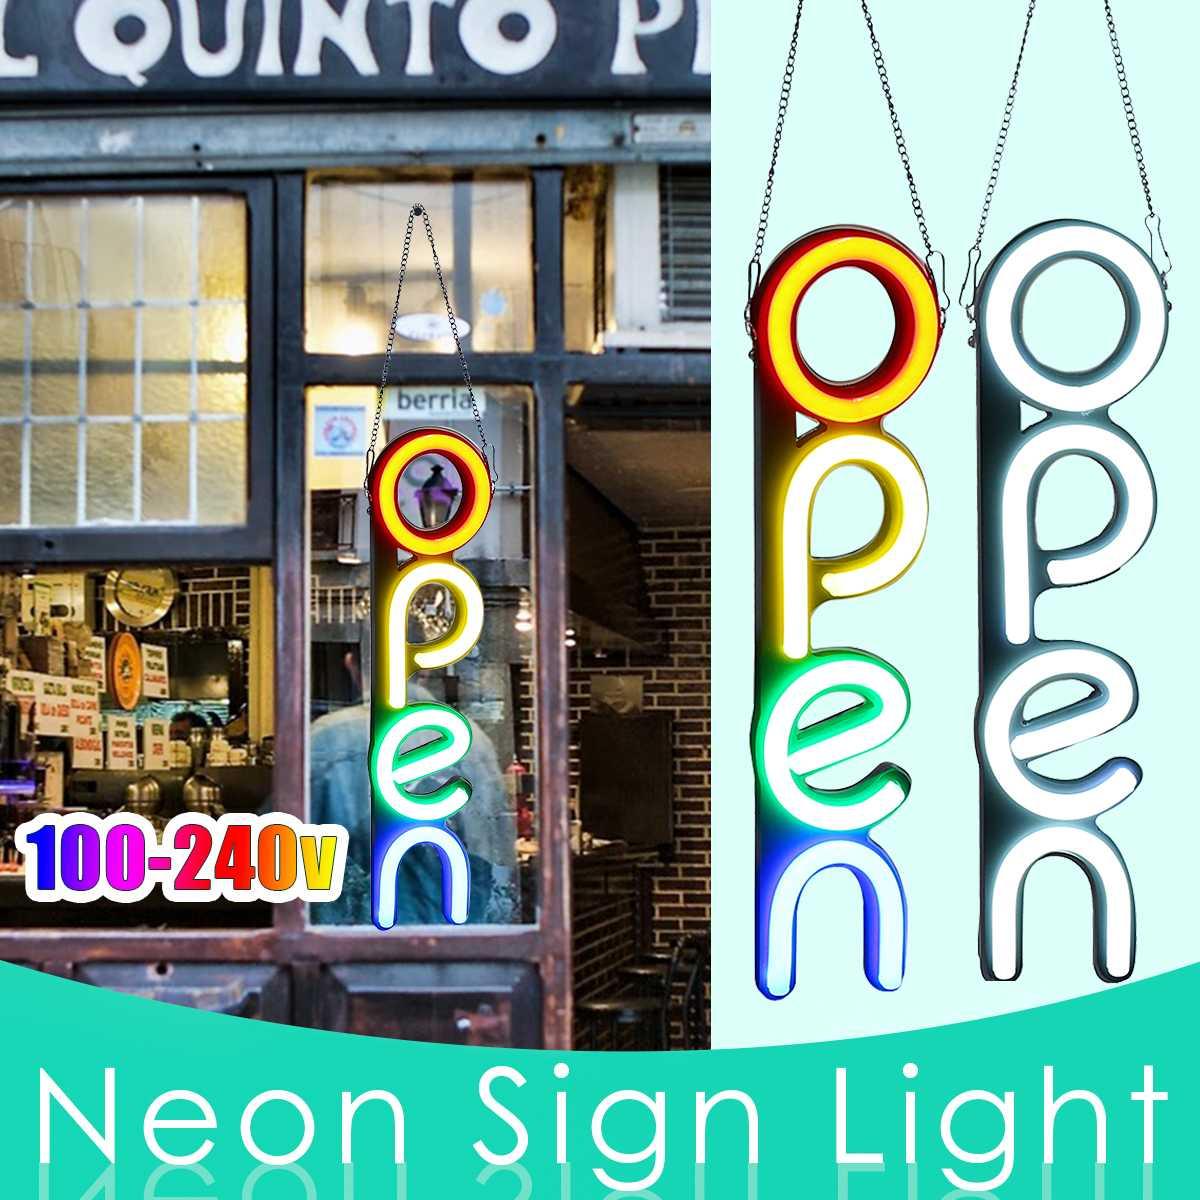 100-240V OPEN Neon Sign Light LED Wall Light Visual Artwork Restaurant Bar Lamp Home Room Shop Decoration Commercial Lighting